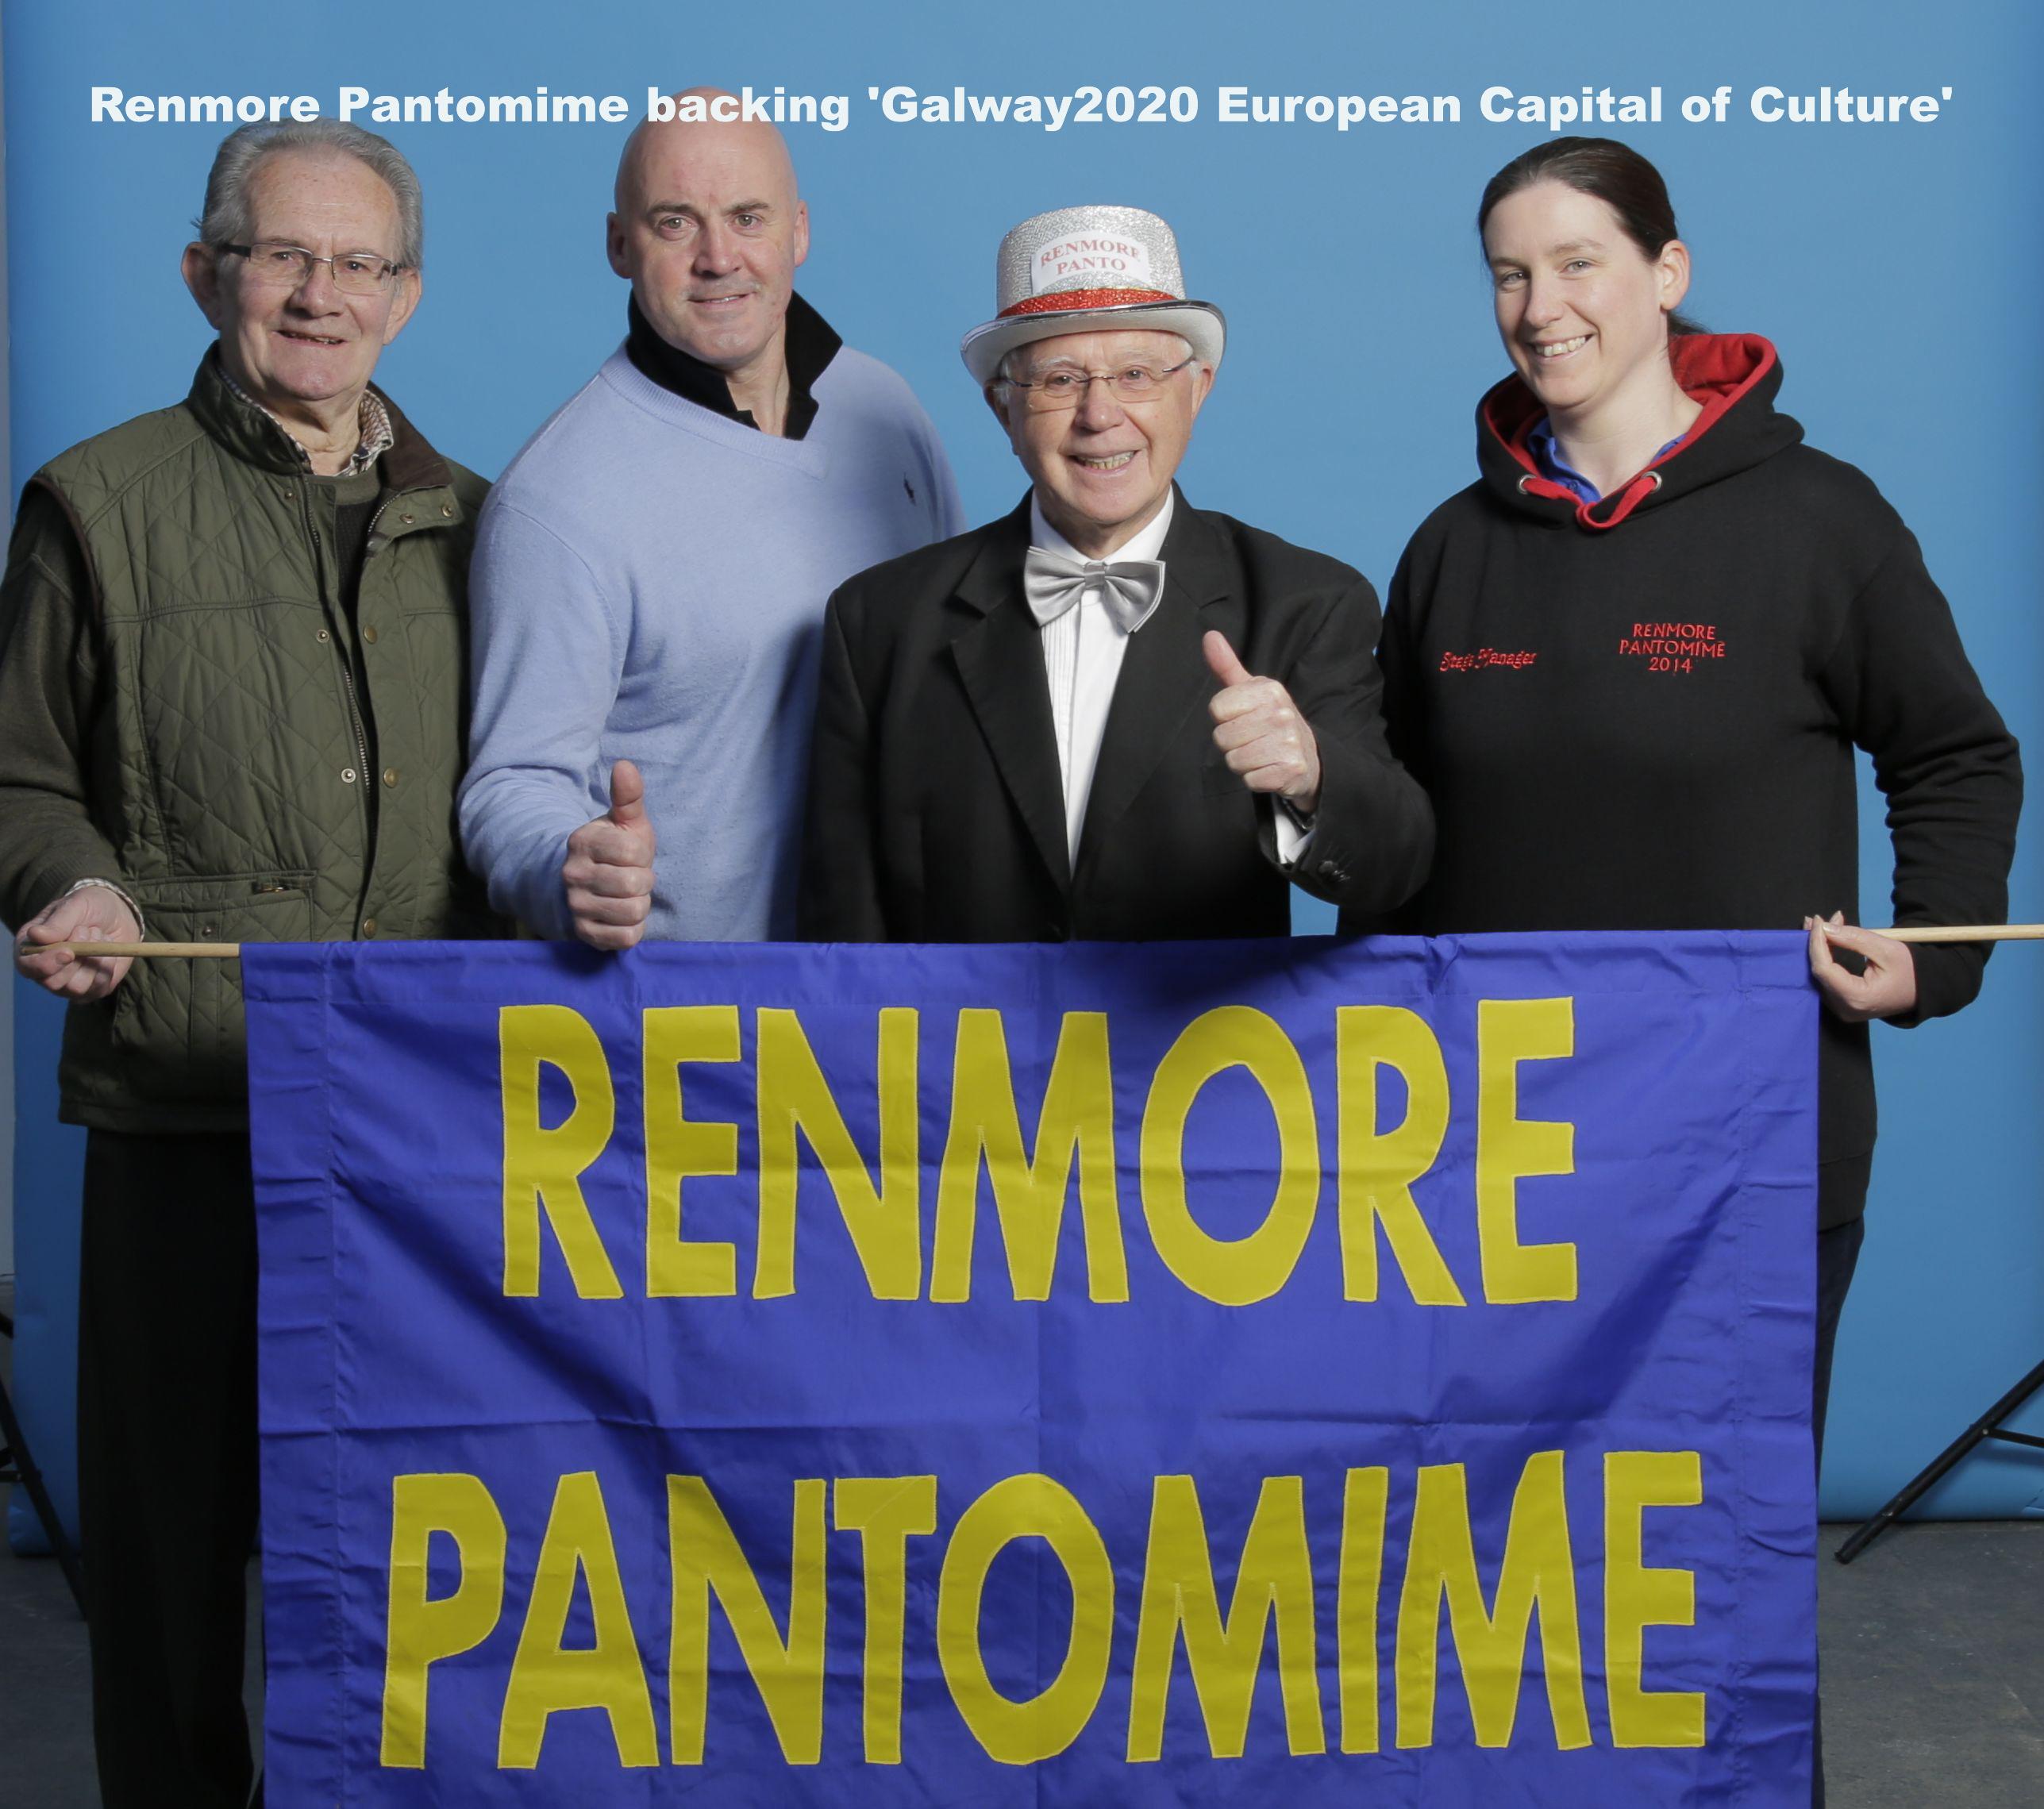 Renmore Pantomine 2020 + banner & script